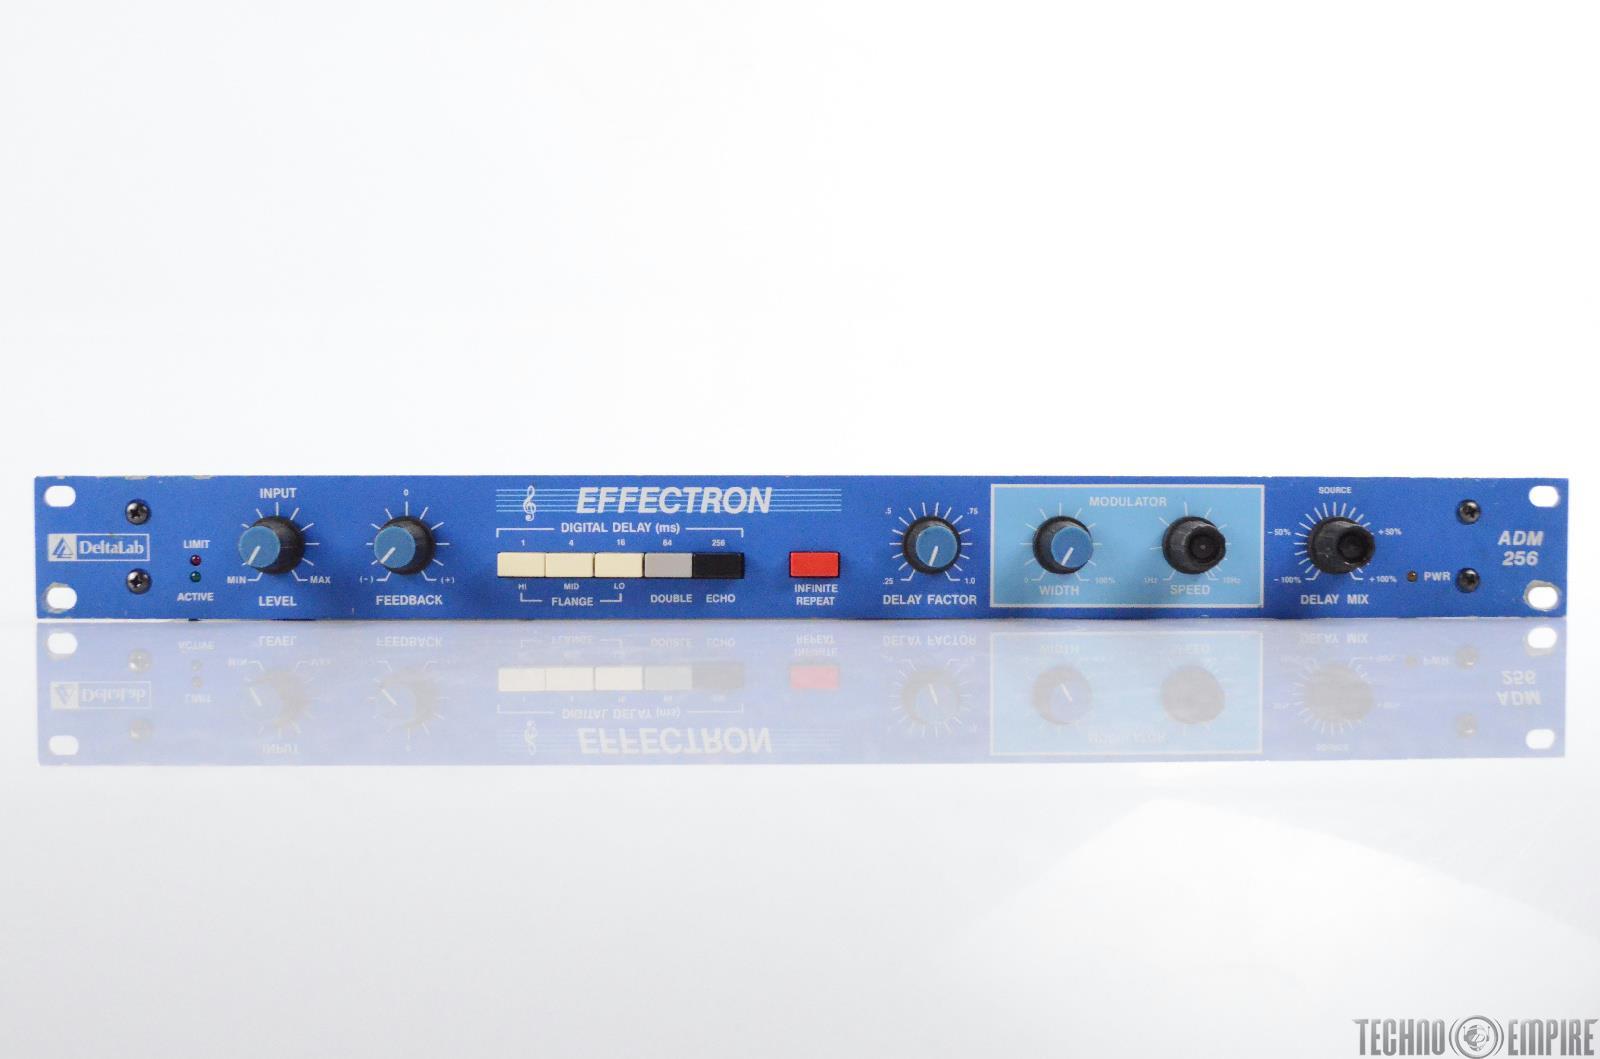 DeltaLab Effectron ADM 256 Digital Delay Echo Doubler Flanger ADM256 Blue #30408 [NEEDS REPAIR]